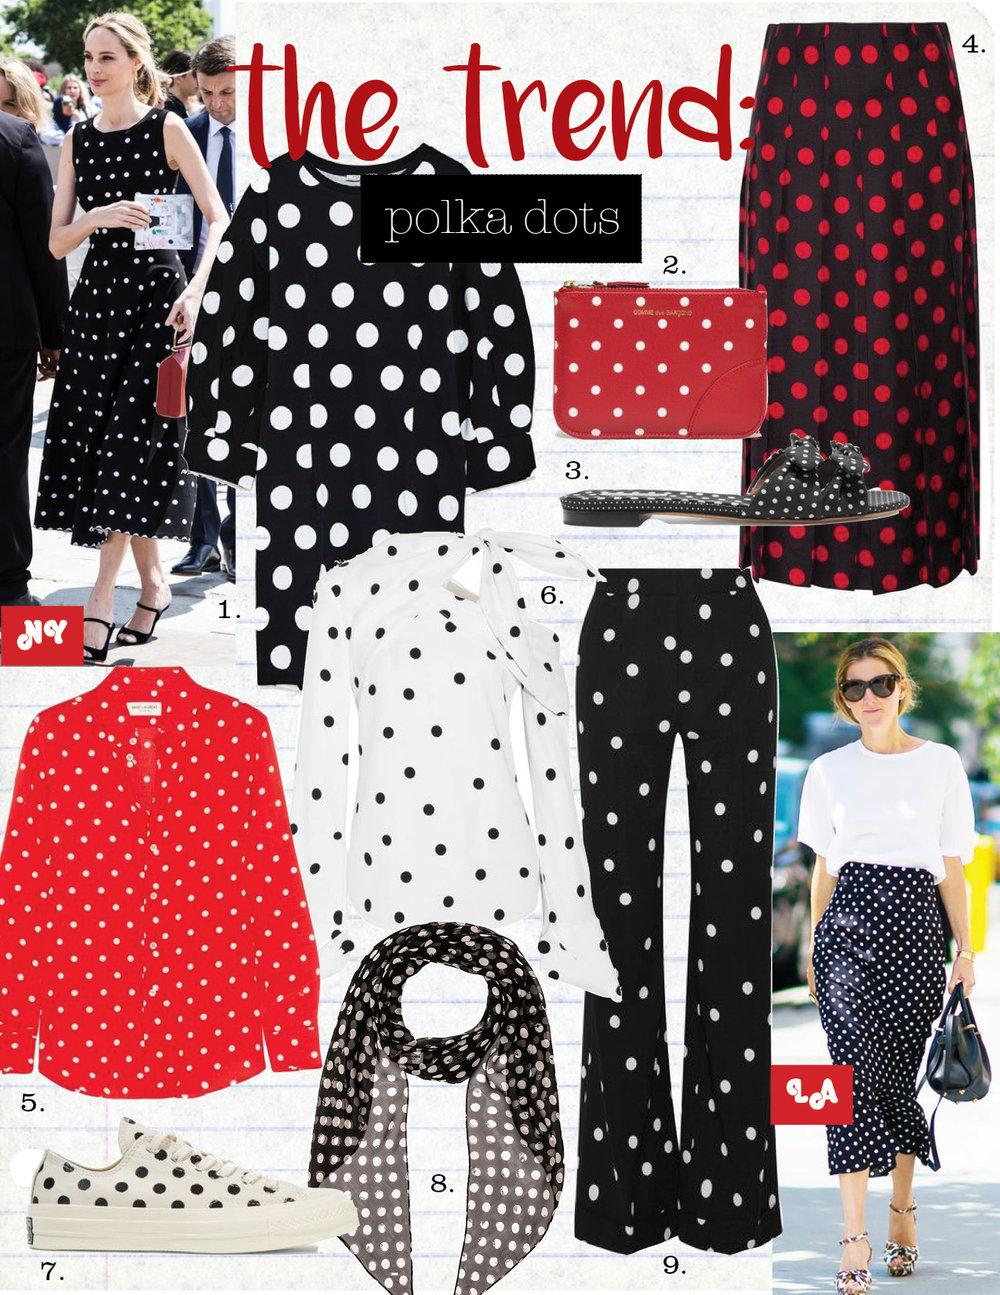 1. zara polka dot dress 19,  zara.com  2. comme des garcons wallet, $158,  needsupply.com  3. tabitha simmons polka-dot bow slides, $575,  net-a-porter.com  4. gucci pleated polka-dot silk-satin twill midi skirt, $1900,  net-a-porter.com  5. saint laurent polka-dot crepe de chine shirt, $594,  net-a-porter.com  6. monse off-the-shoulder polka-dot silk-blend top, $1090,  net-a-porter.com  7. converse chuck taylor all star embroidered leather sneakers, $36,  net-a-porter.com  8. saint laurent silk polka dot scarf, $395,  fwrd.com  9. monse polka dot silk-blend crepe wide-leg pants, $1390,  net-a-porter.com